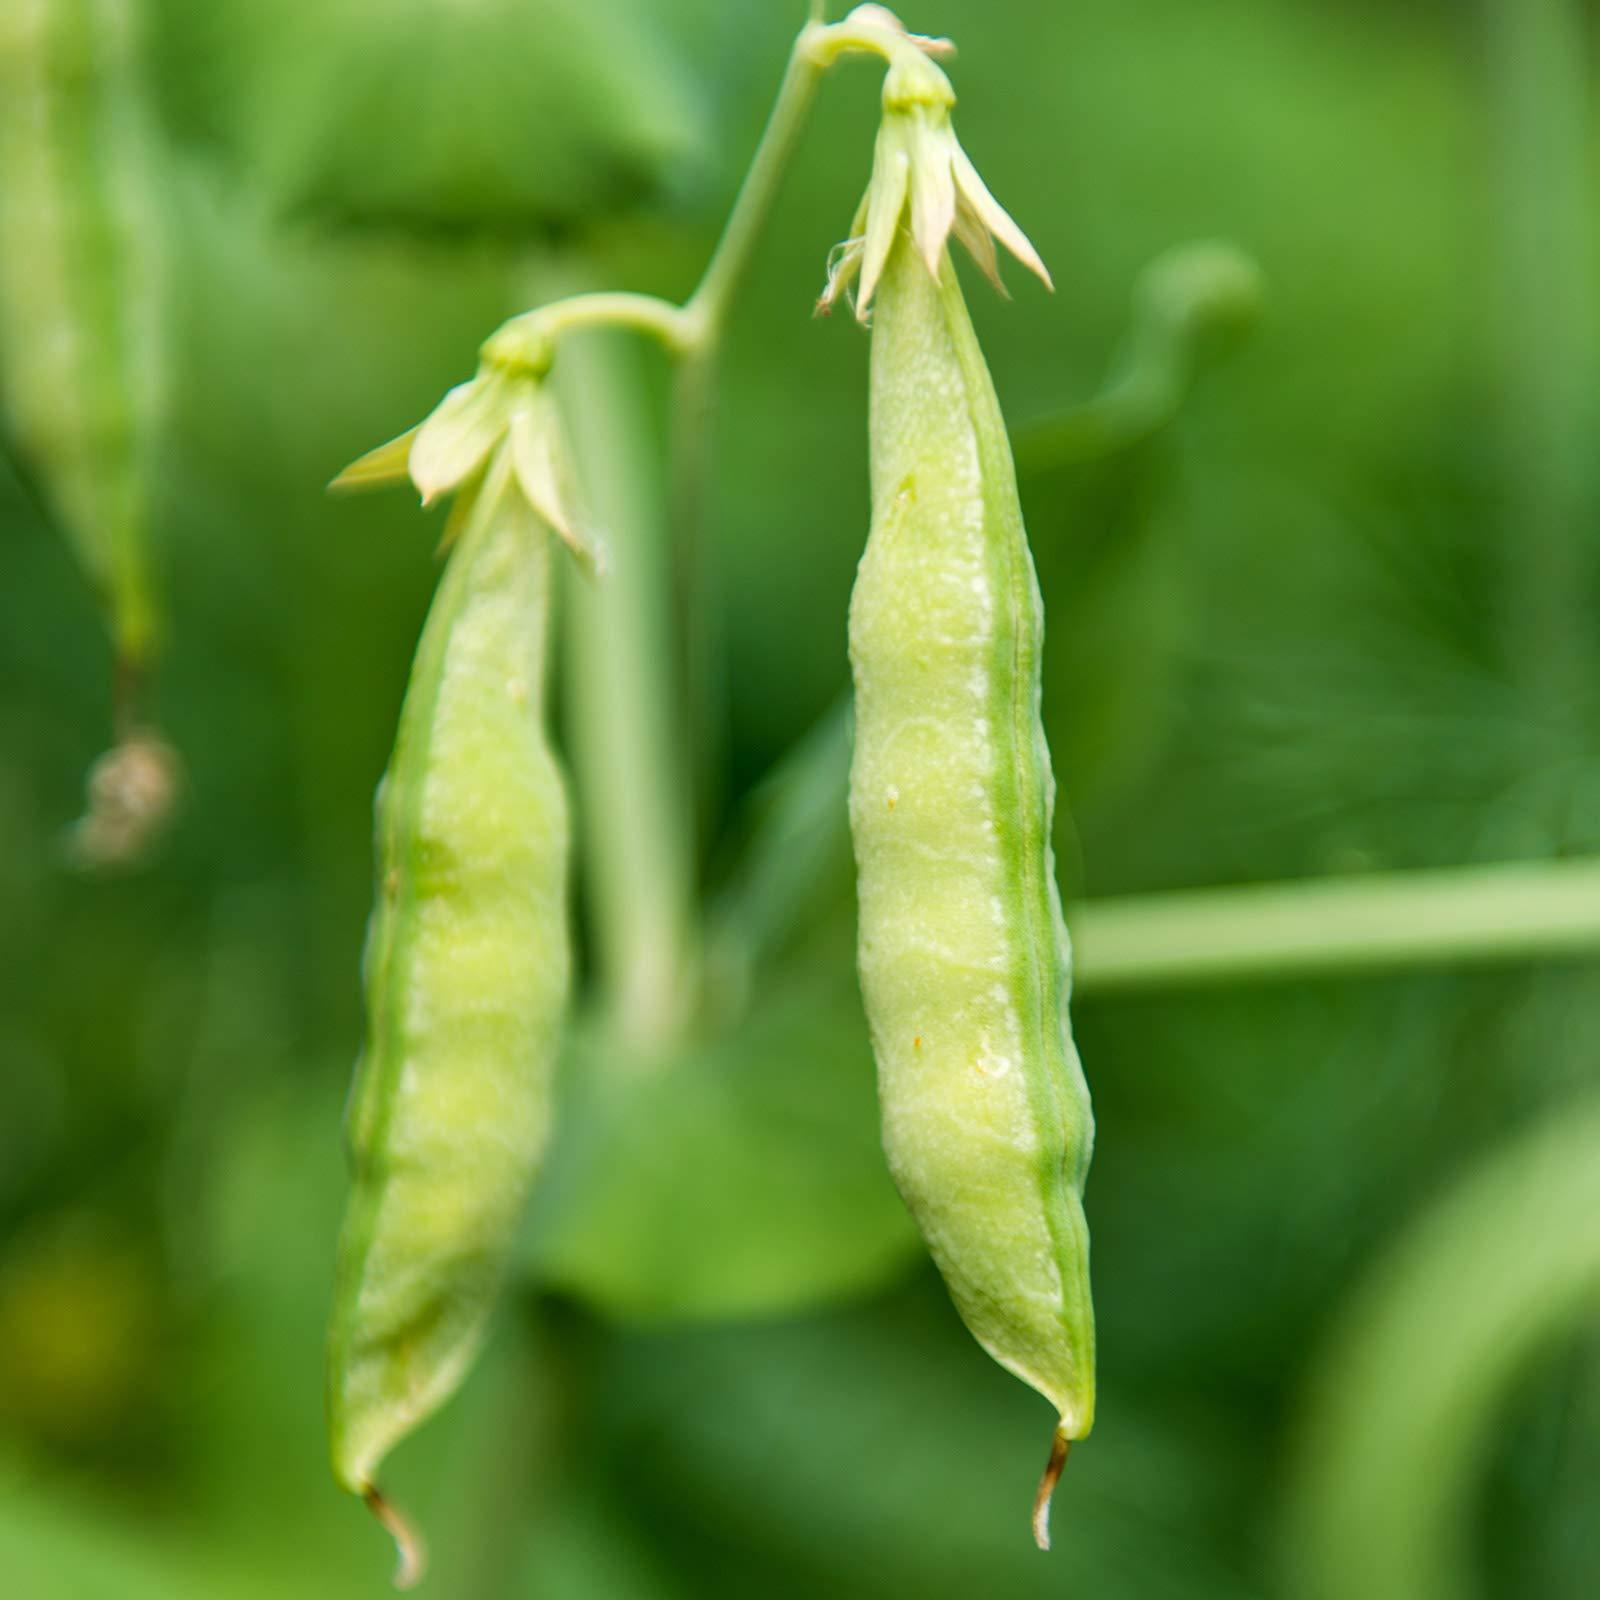 Organic Yellow Pea Sprouting Seeds - 50 Lb Bulk - Non-GMO, Heirloom - Microgreens Pea Shoots, Sprouts, Vegetable Garden, Cover Crop